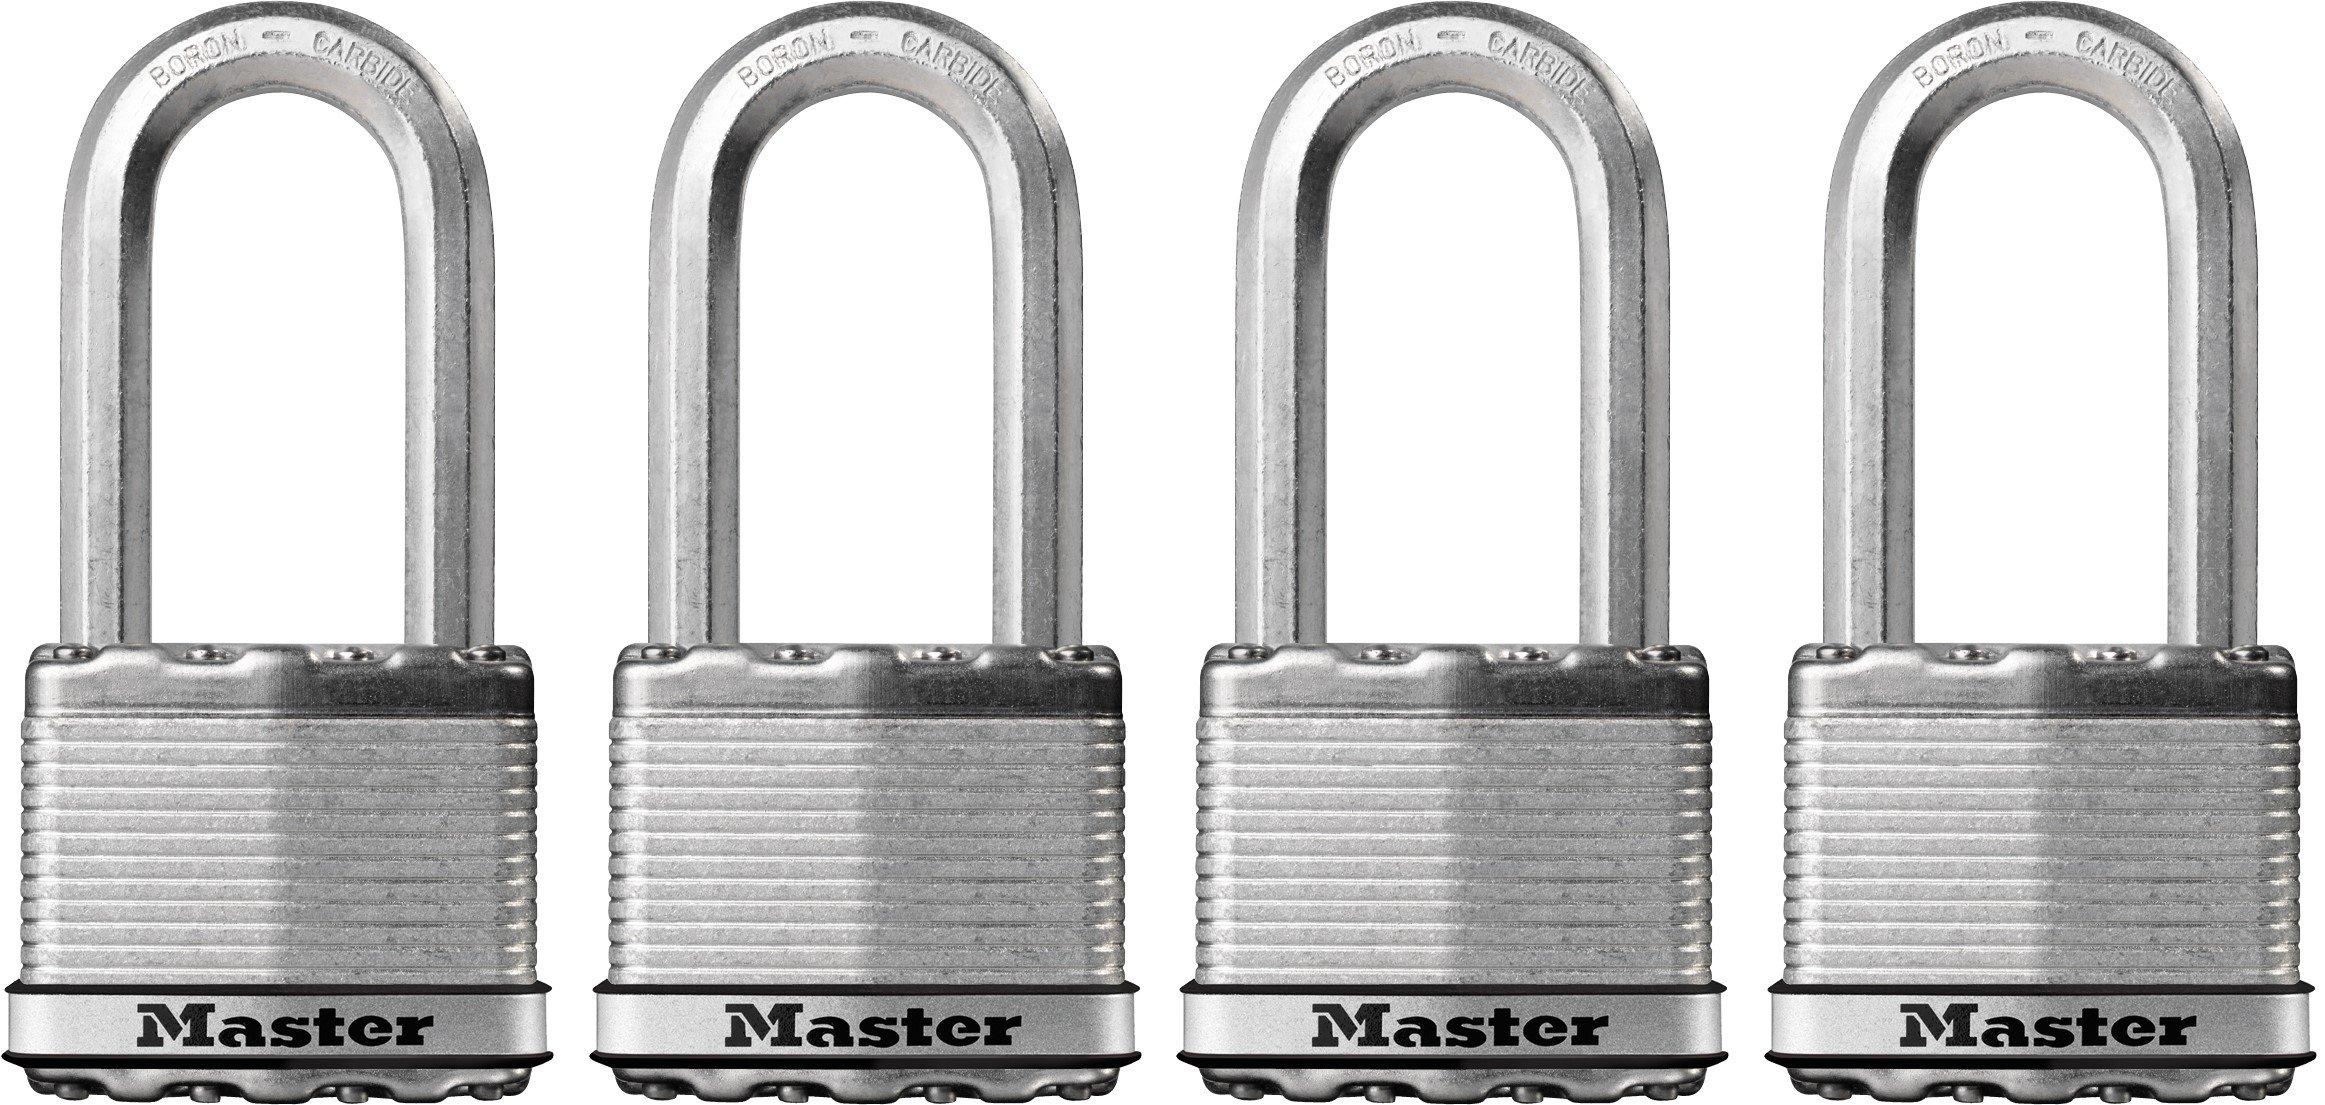 Master Lock Padlock, Magnum Laminated Steel Lock, 2 in. Wide, M5XQLH (Pack of 4-Keyed Alike)